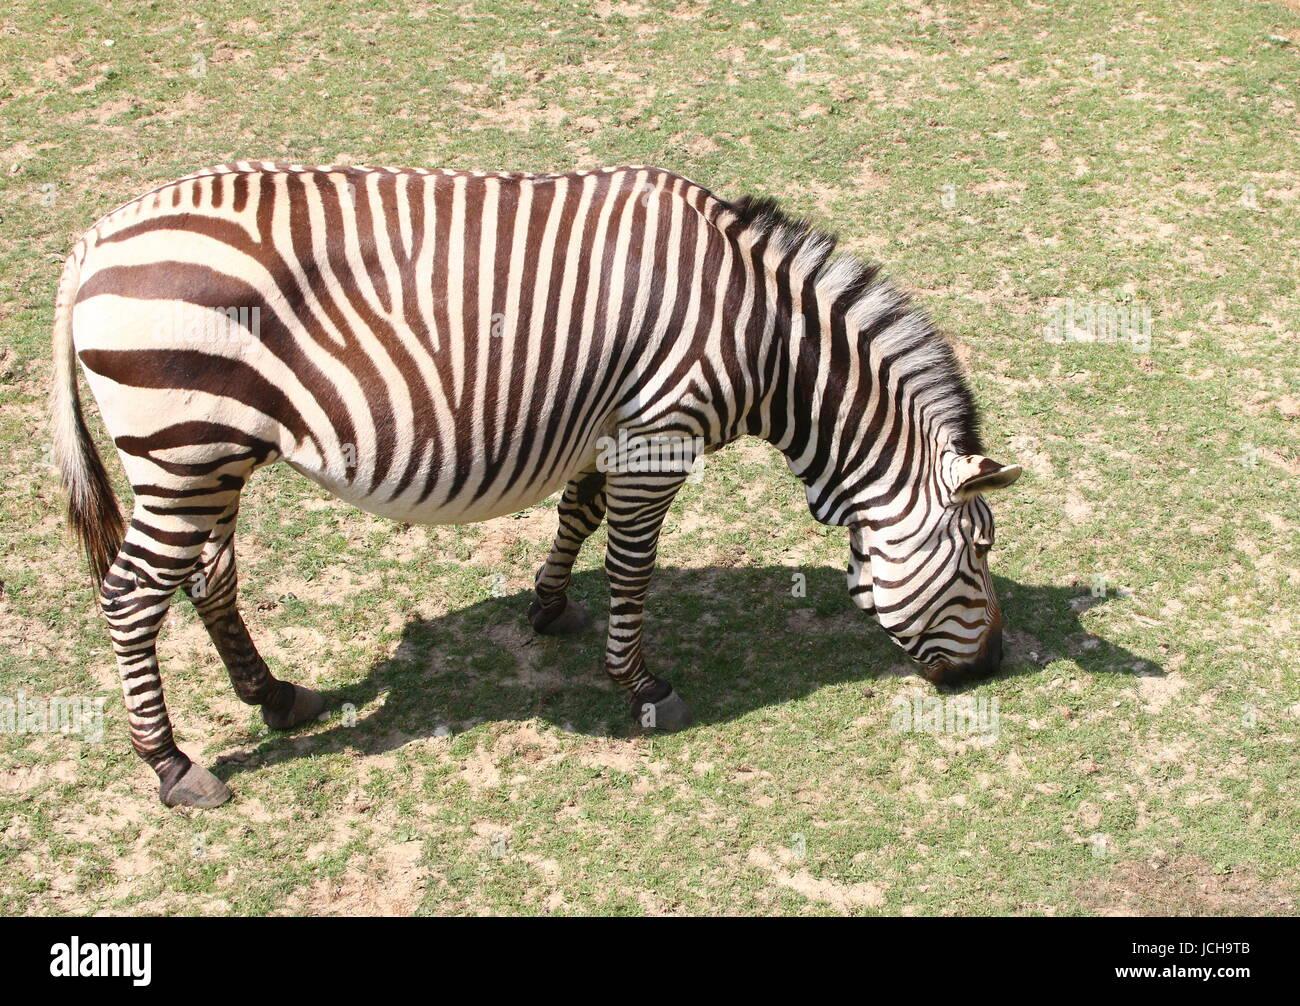 Hartmann's mountain zebra (Equus zebra hartmannae), a rare subspecies of the South African Mountain Zebra, found - Stock Image